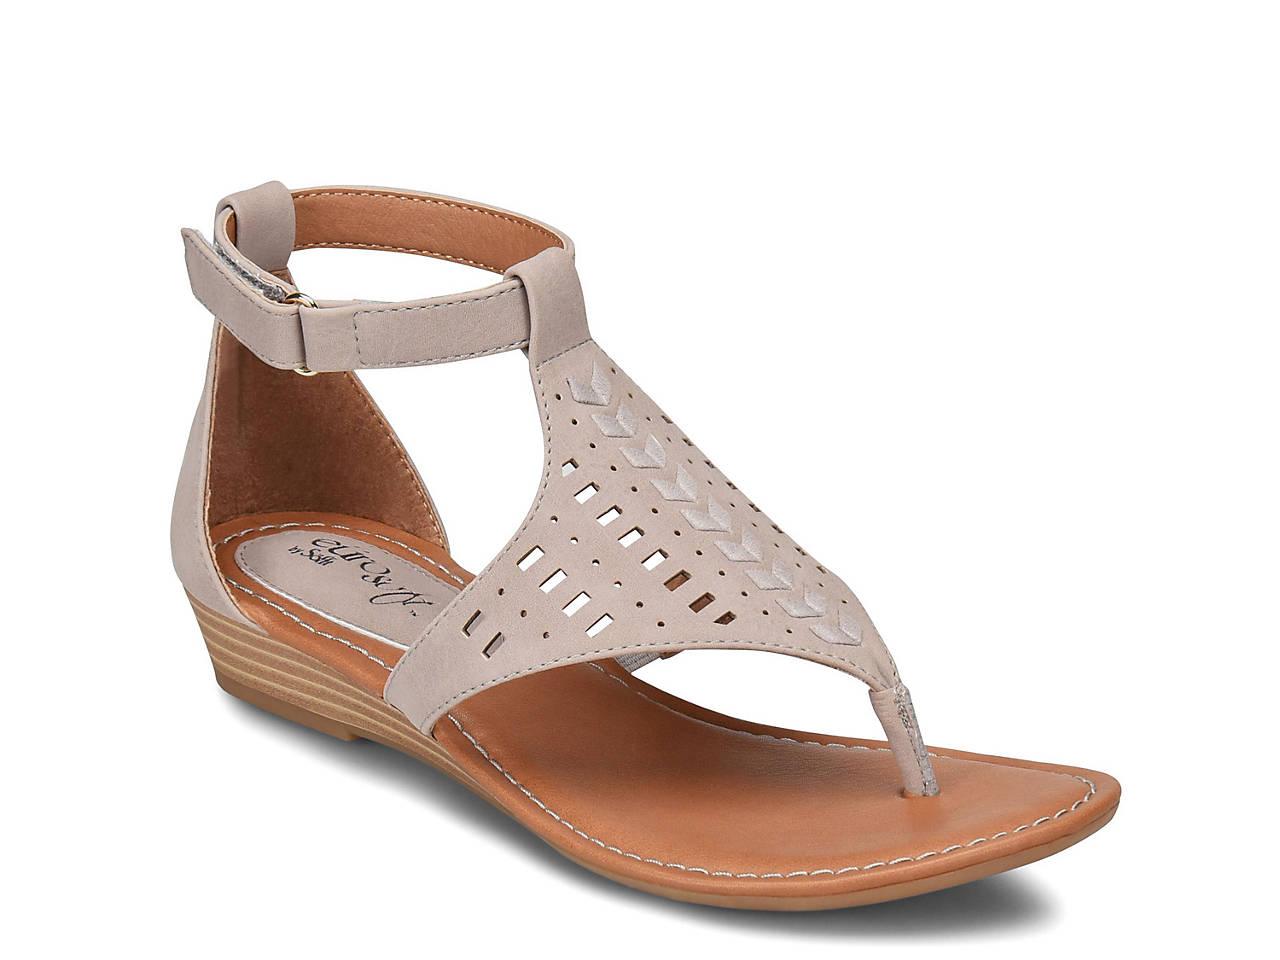 2c300f901c0e Eurosoft Melis Wedge Sandal Women s Shoes